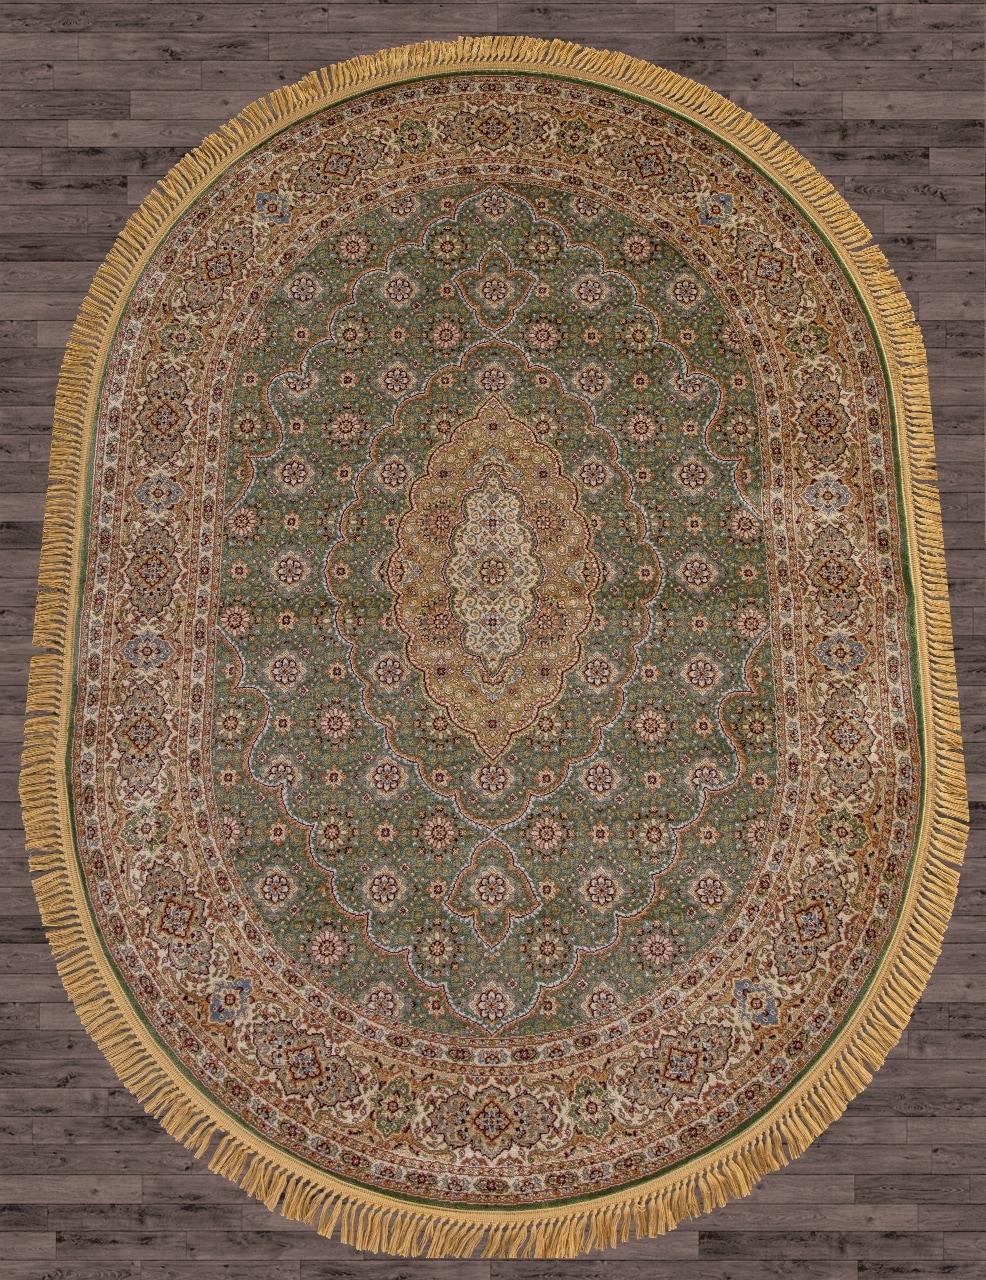 Ковер D159 - GREEN - Овал - коллекция BUHARA - фото 1